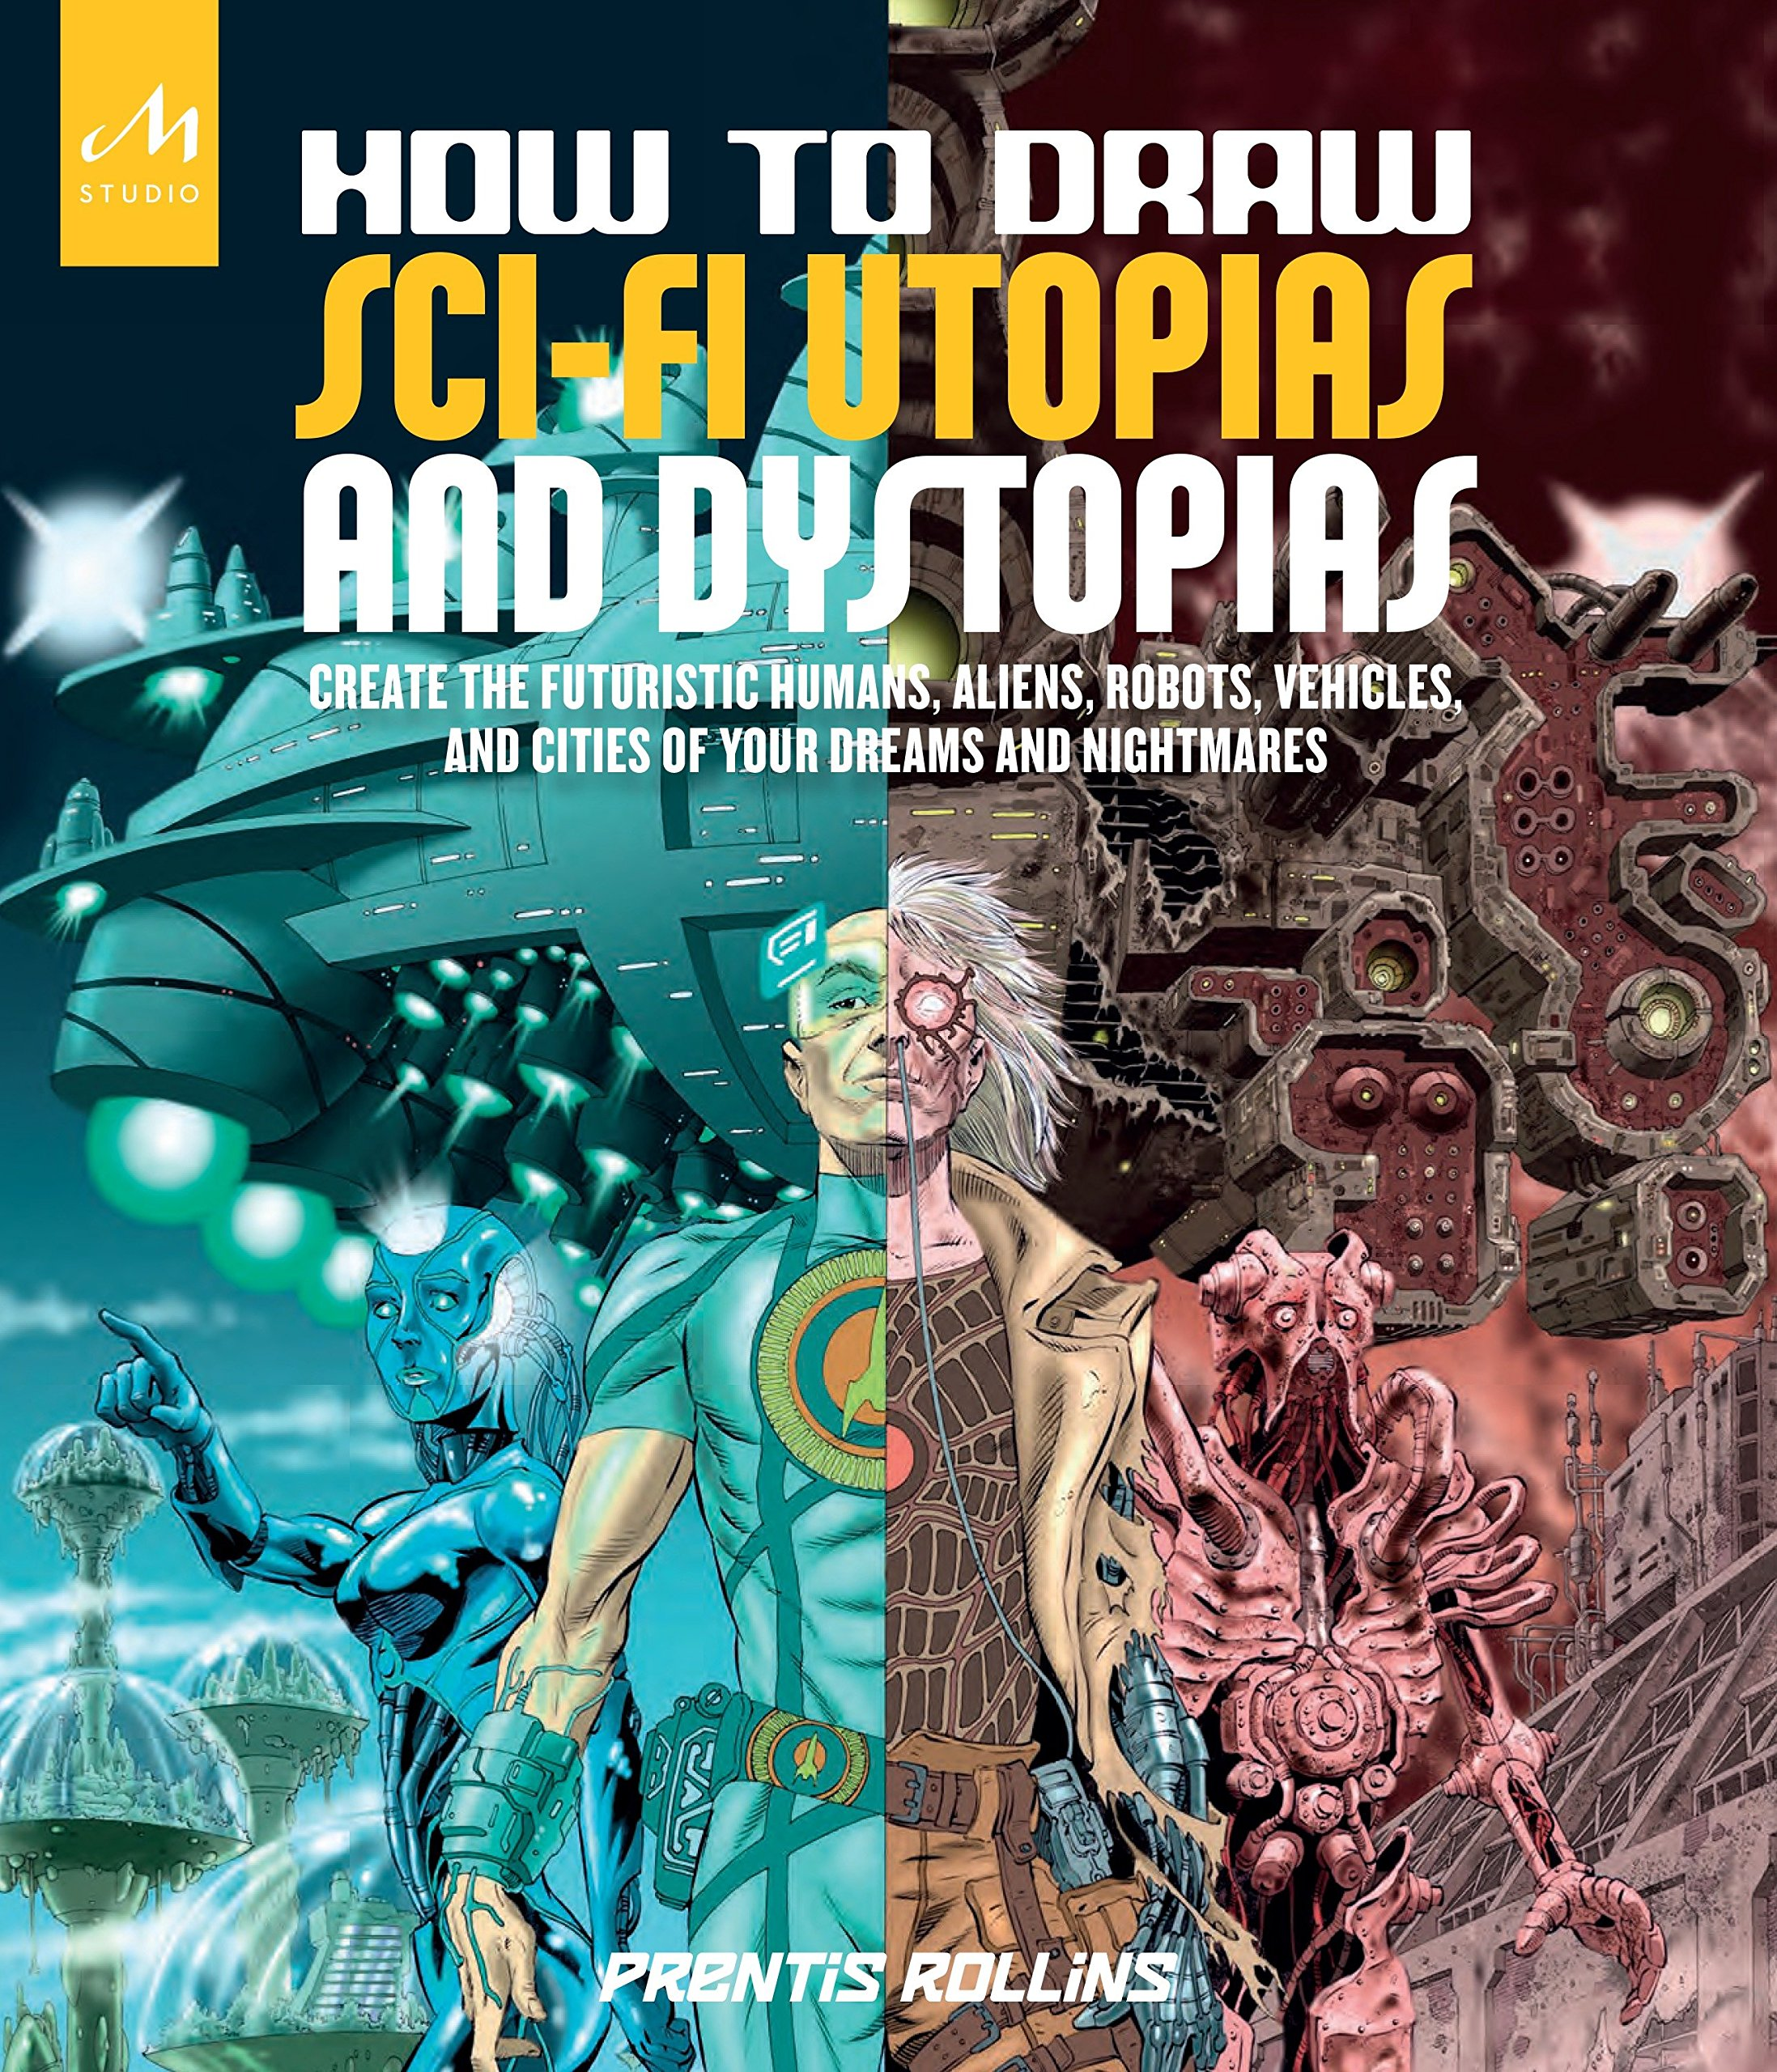 Amazon.com: How to Draw Sci-Fi Utopias and Dystopias: Create the ...